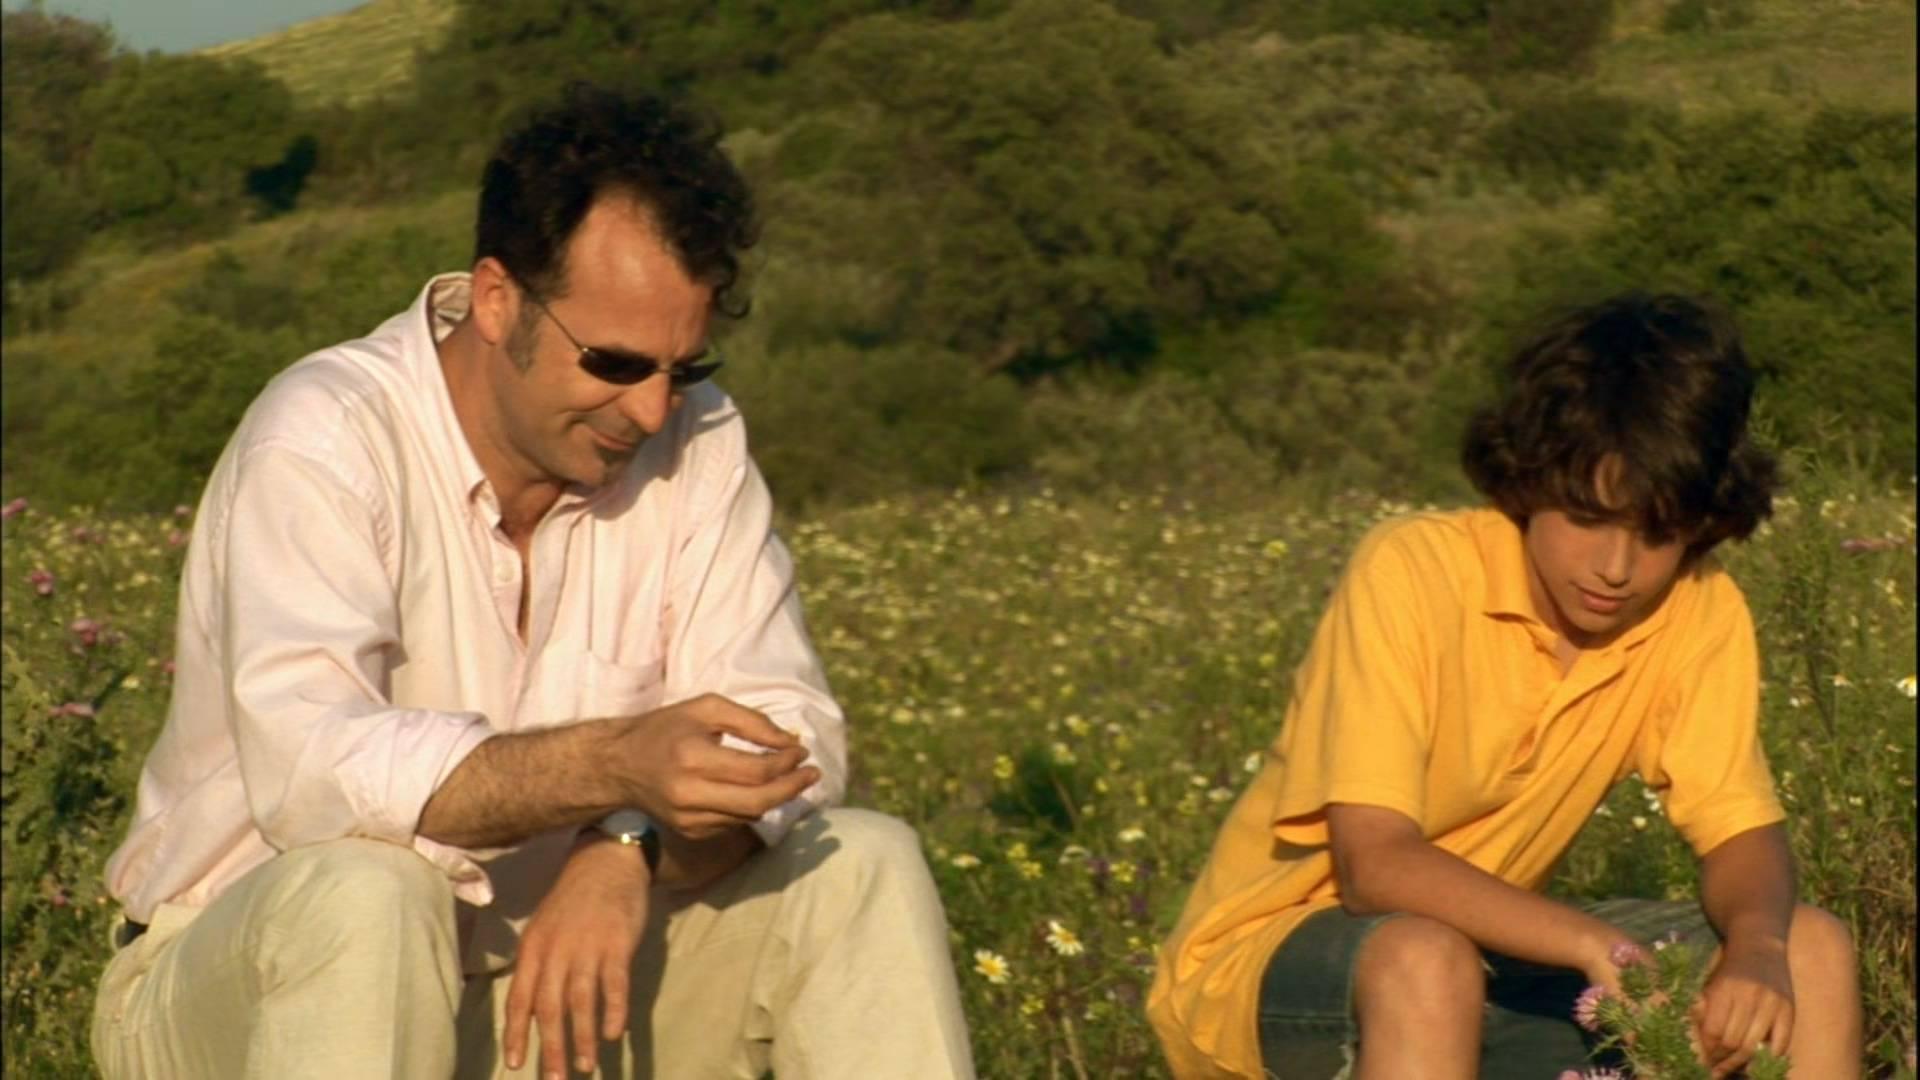 En tu ausencia (2008) / AvaxHome